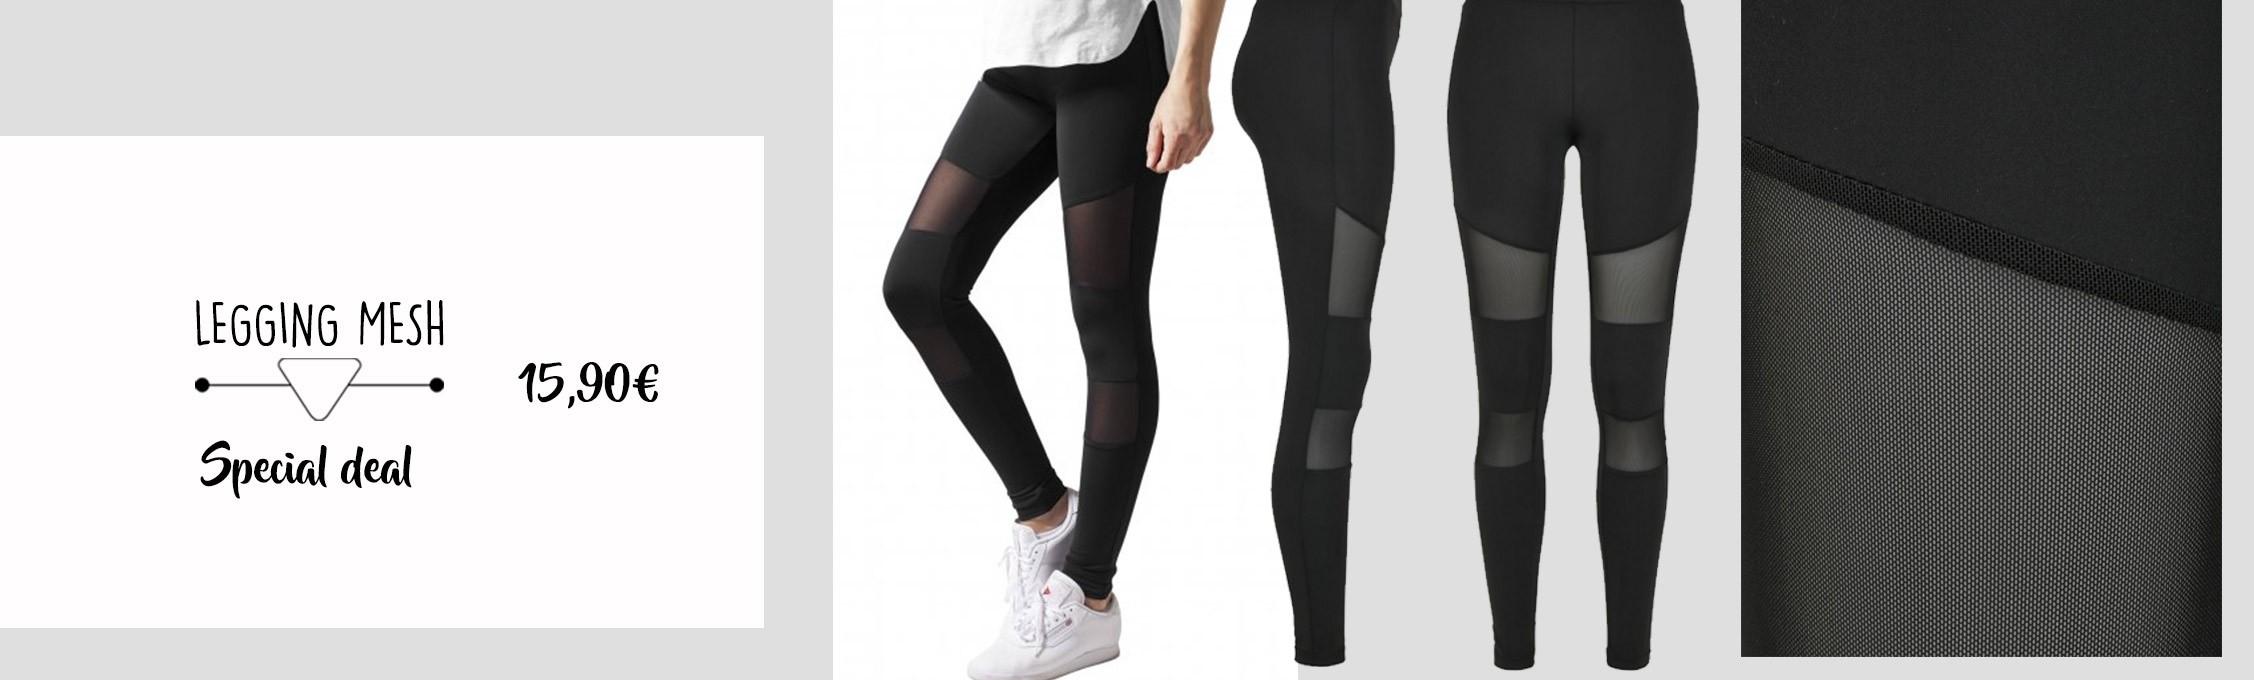 great deal for urban legging mesh